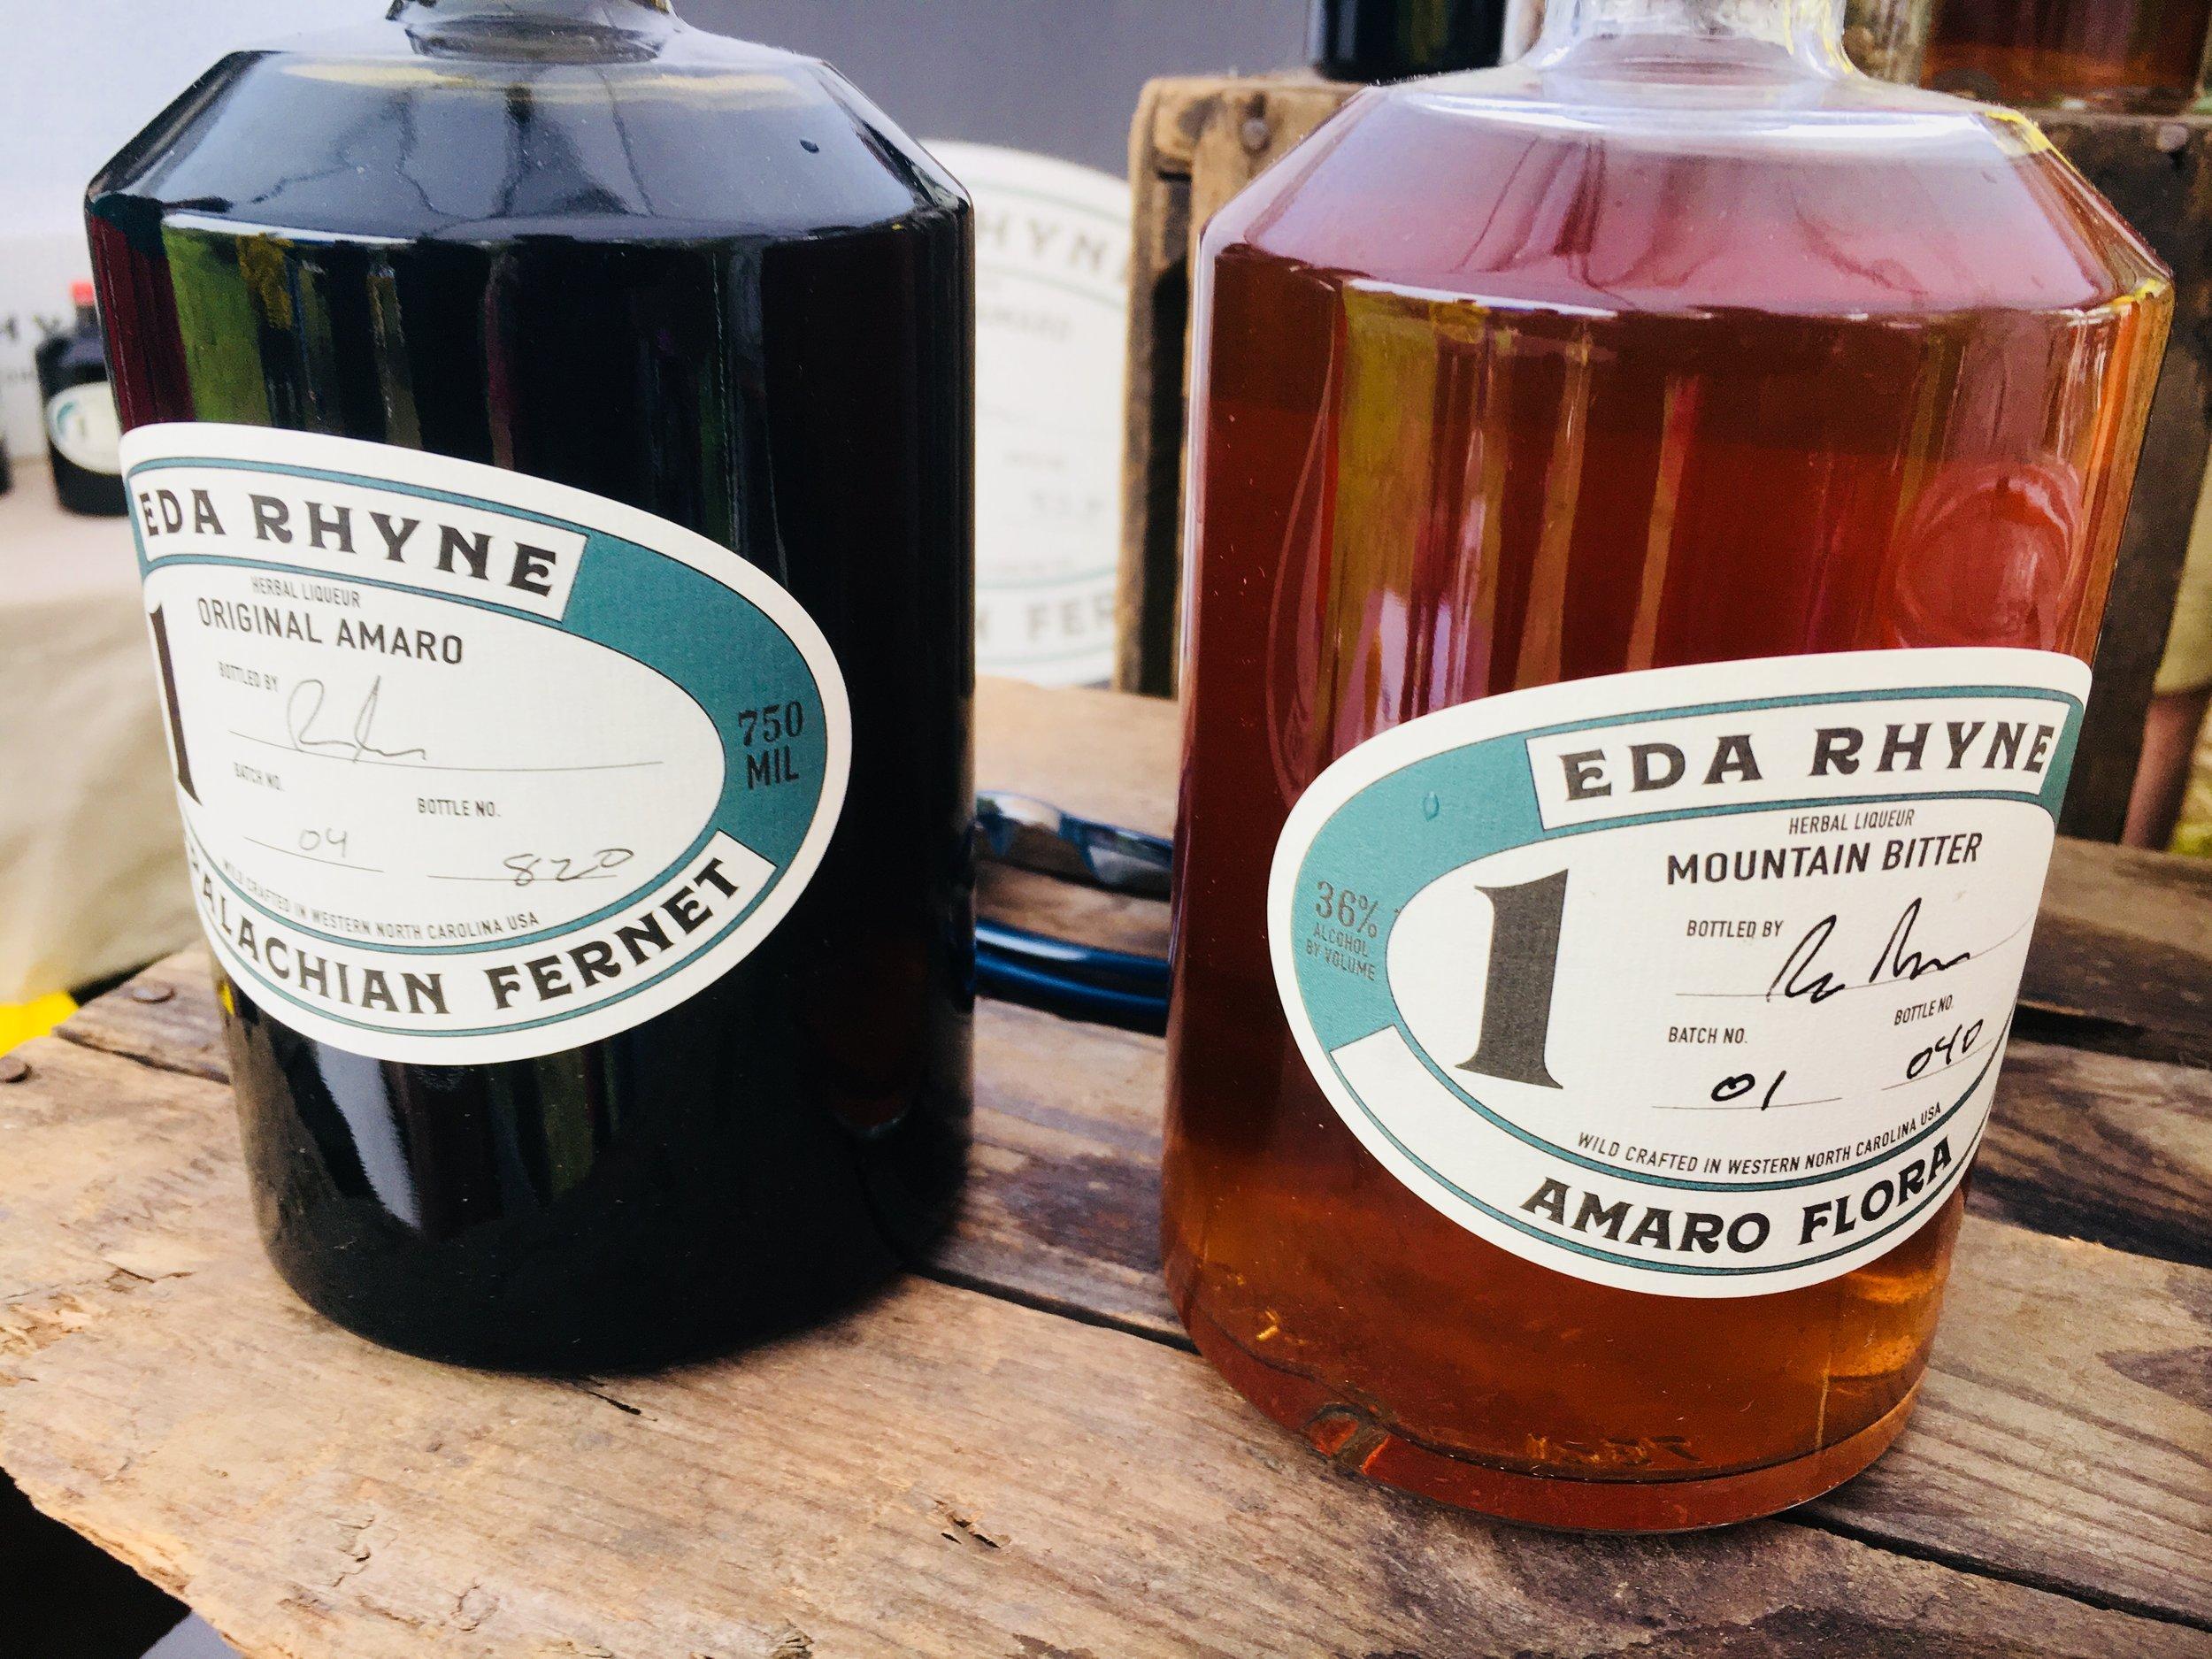 Eda Rhyne Distillery